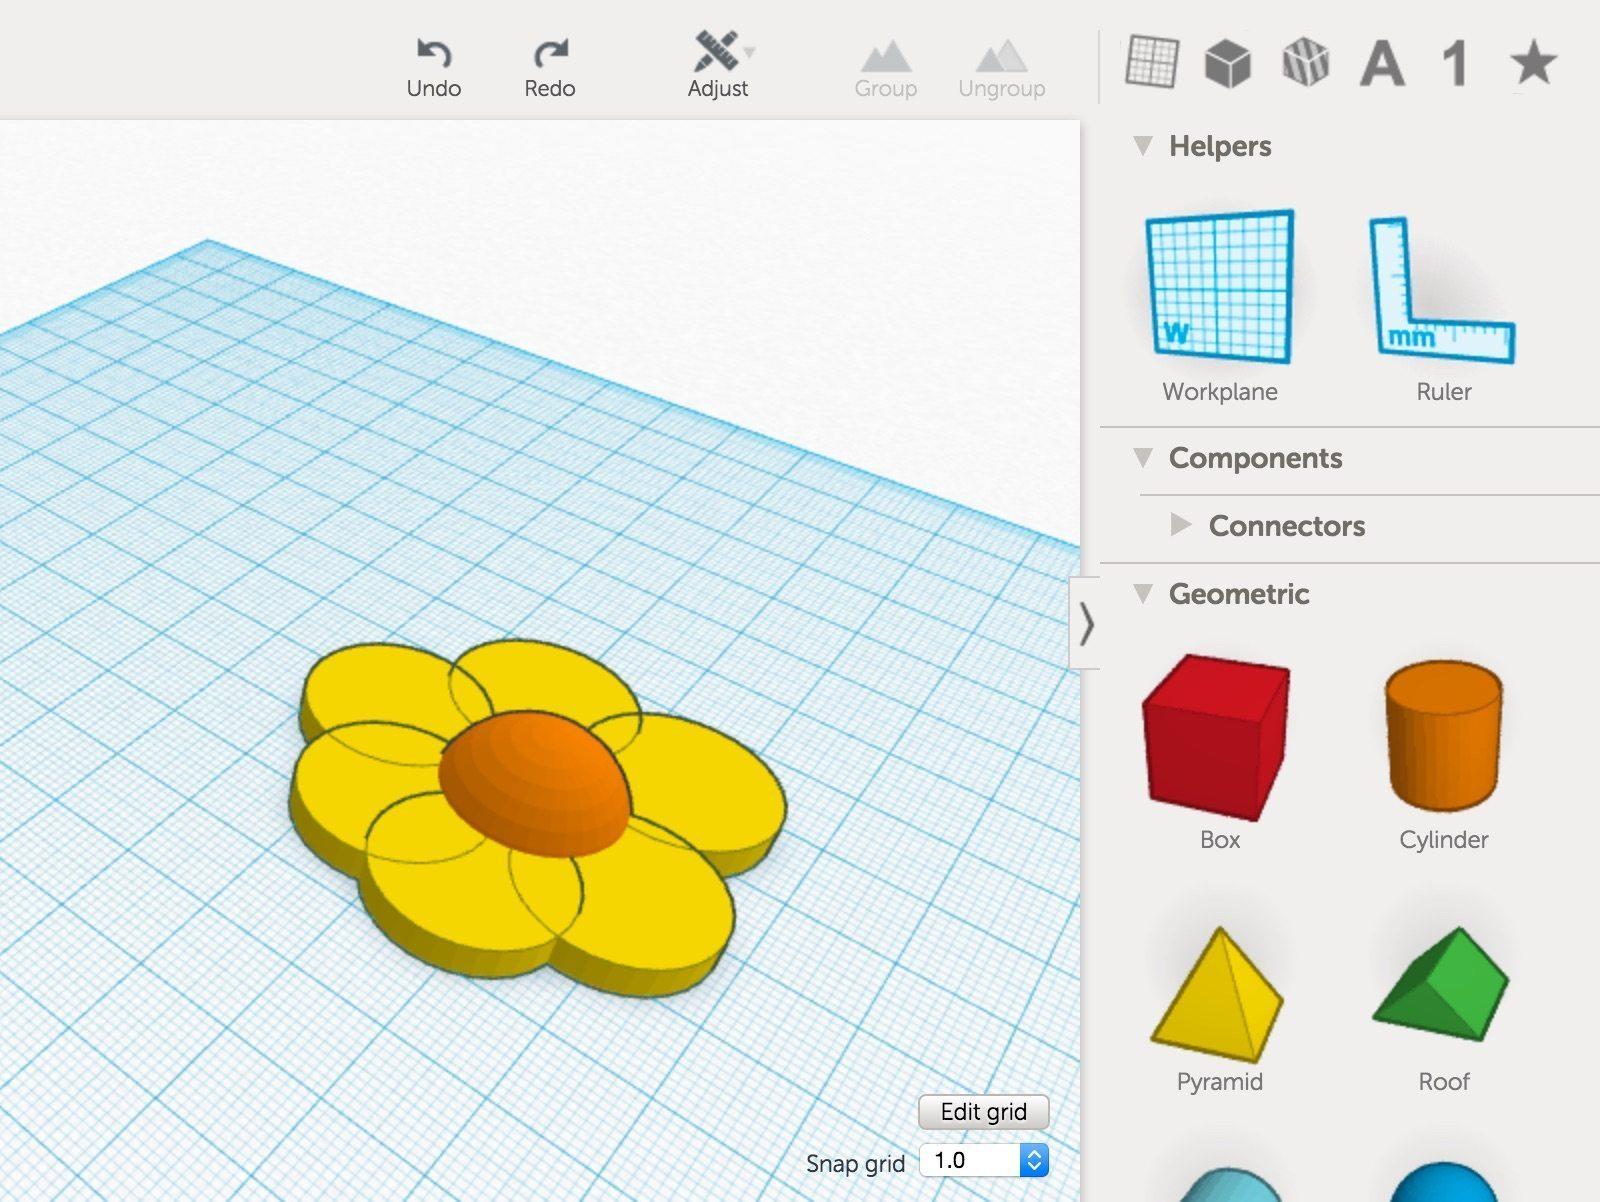 Pt 1 Step 1 - Create shape